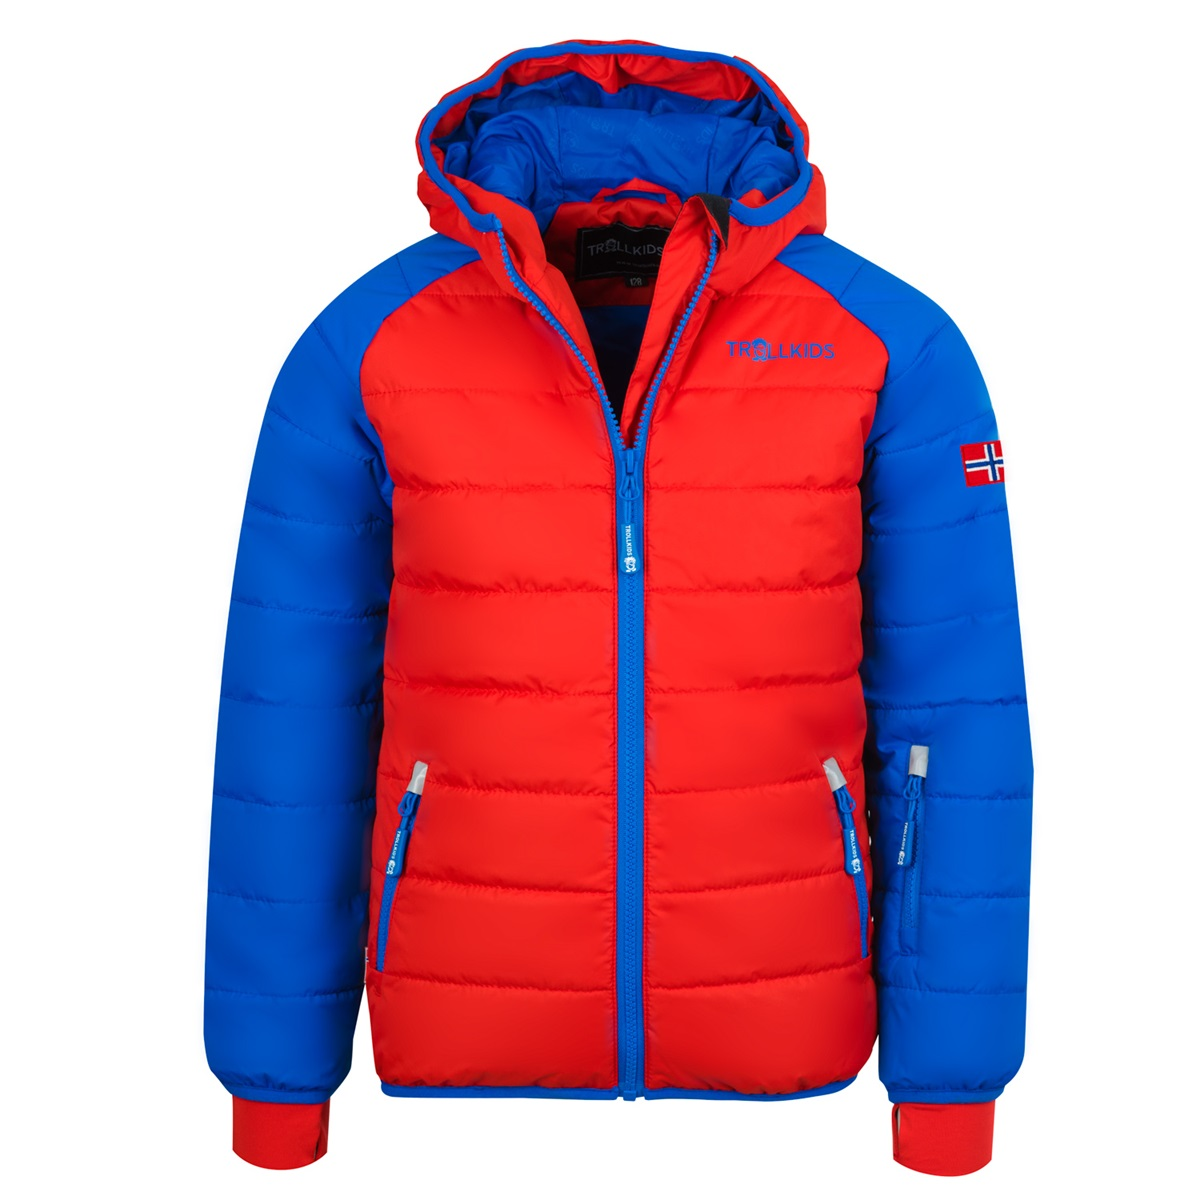 Trollkids Hafjell Snow Jacket XT Kids   tapir store